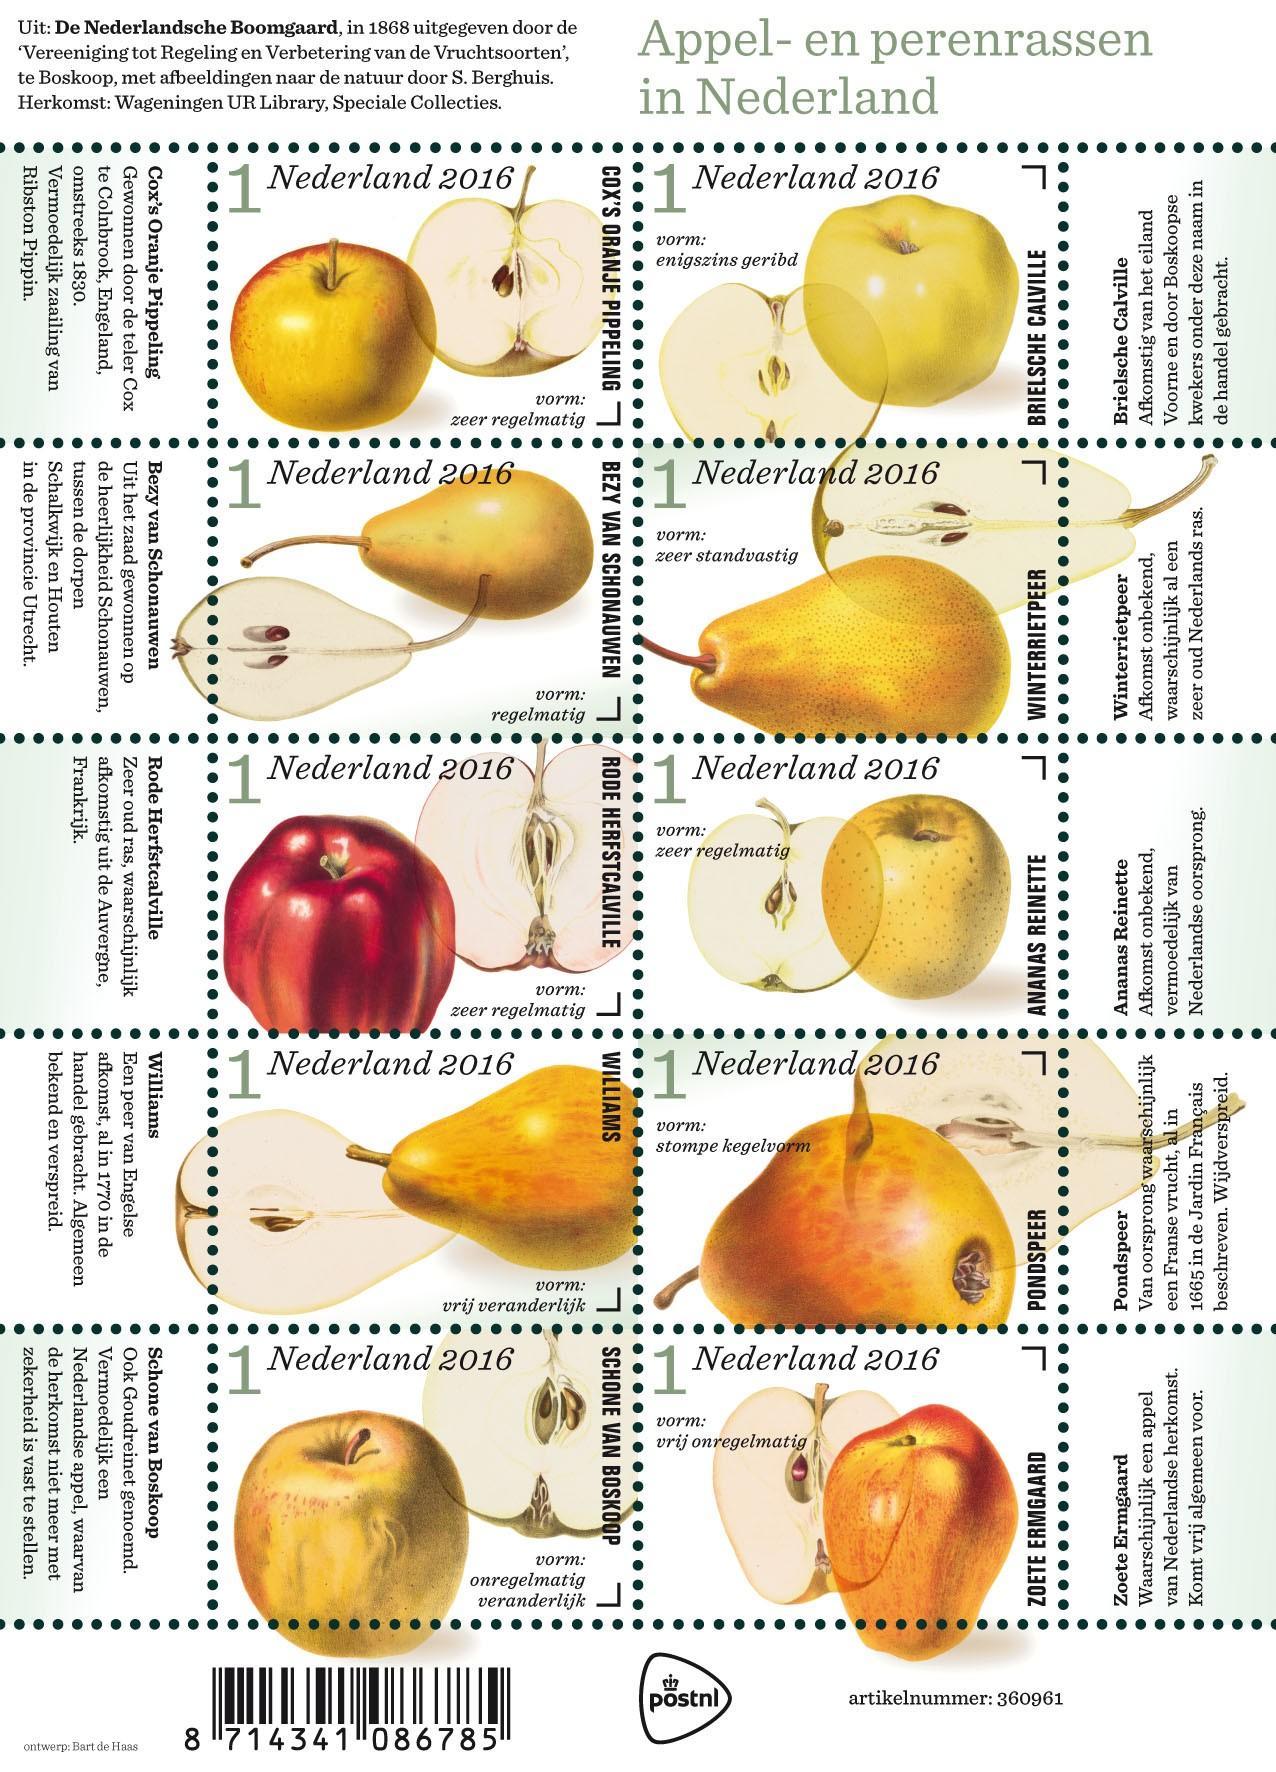 Appel en perenrassen